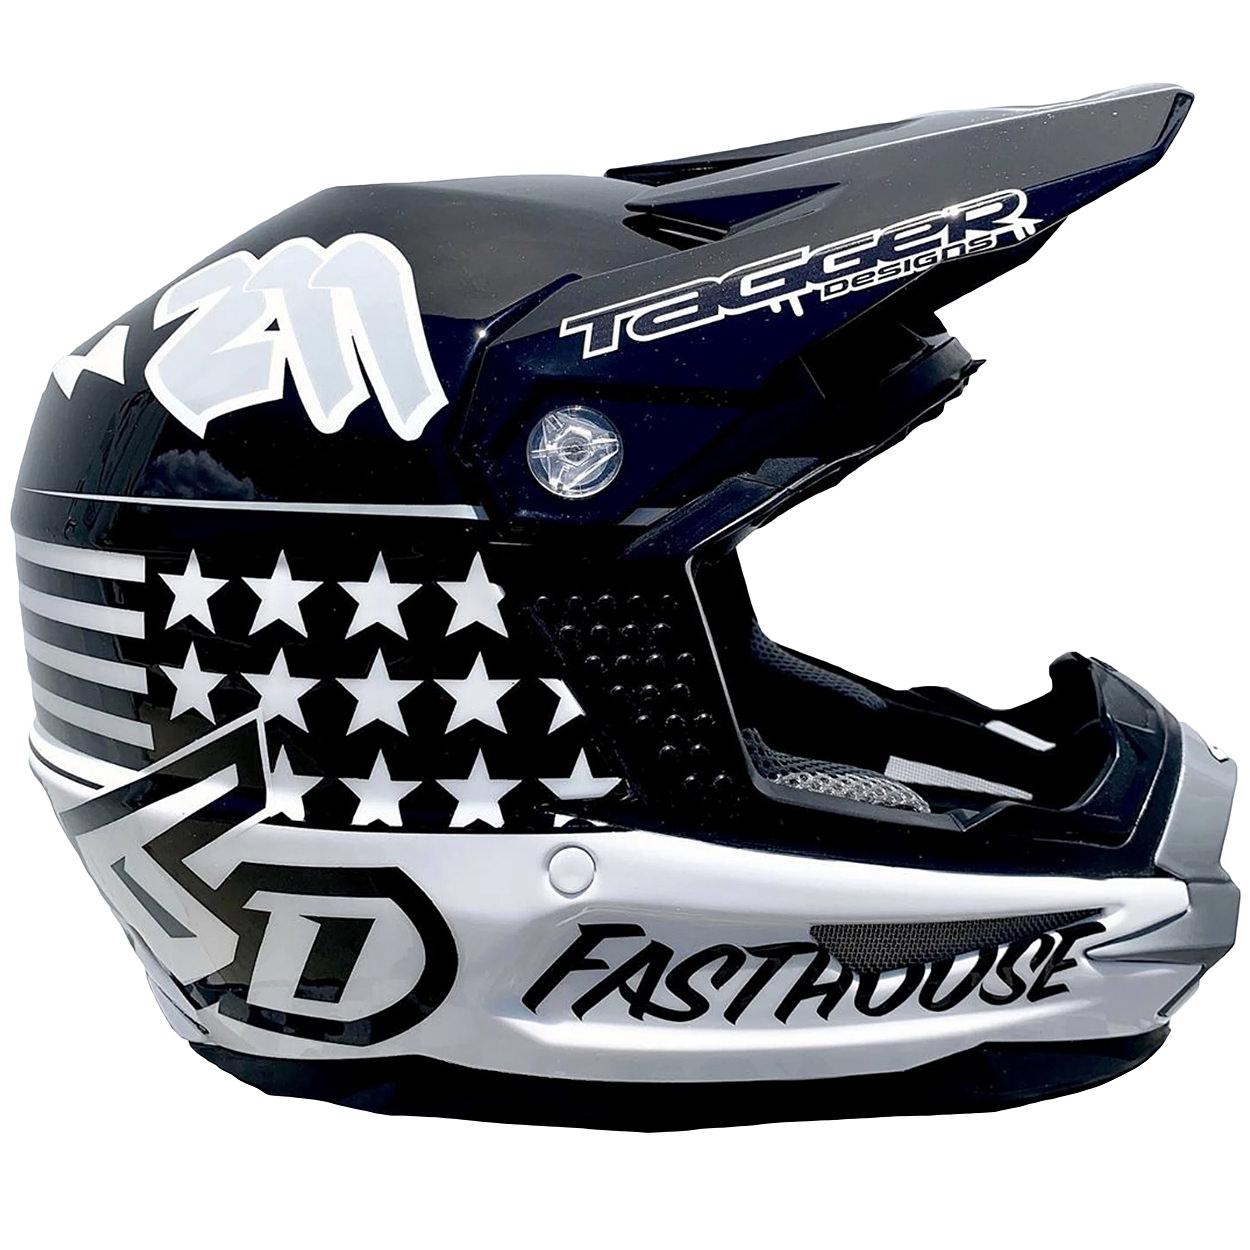 Custom motorcycle helmet by designer Tag Gasparian of Tagger Designs